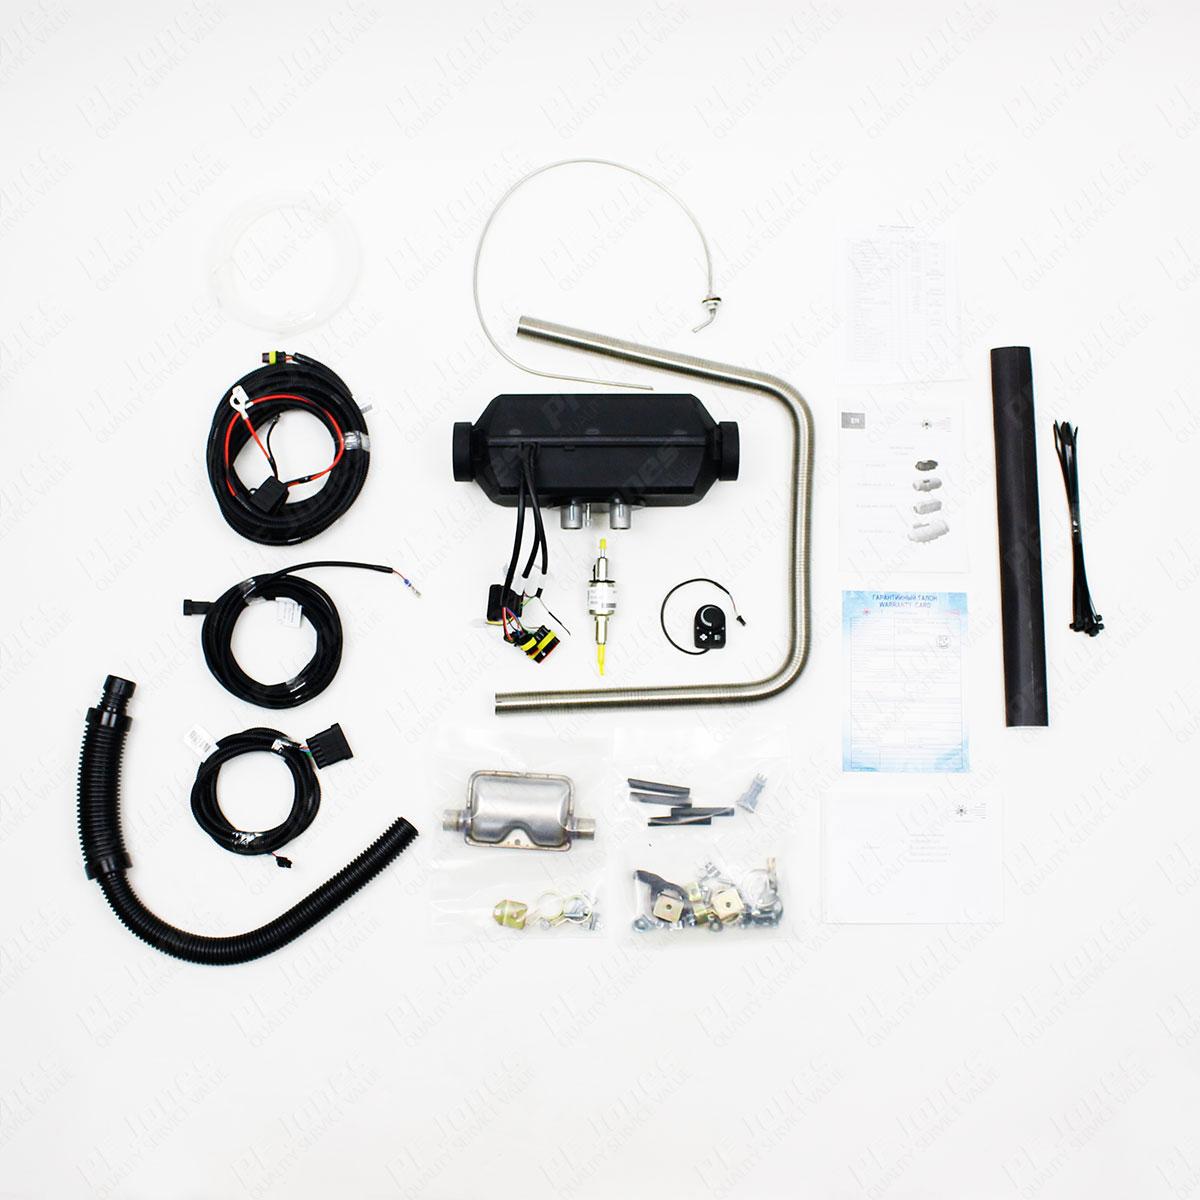 Planar 2D-12-TM Air Heater Set